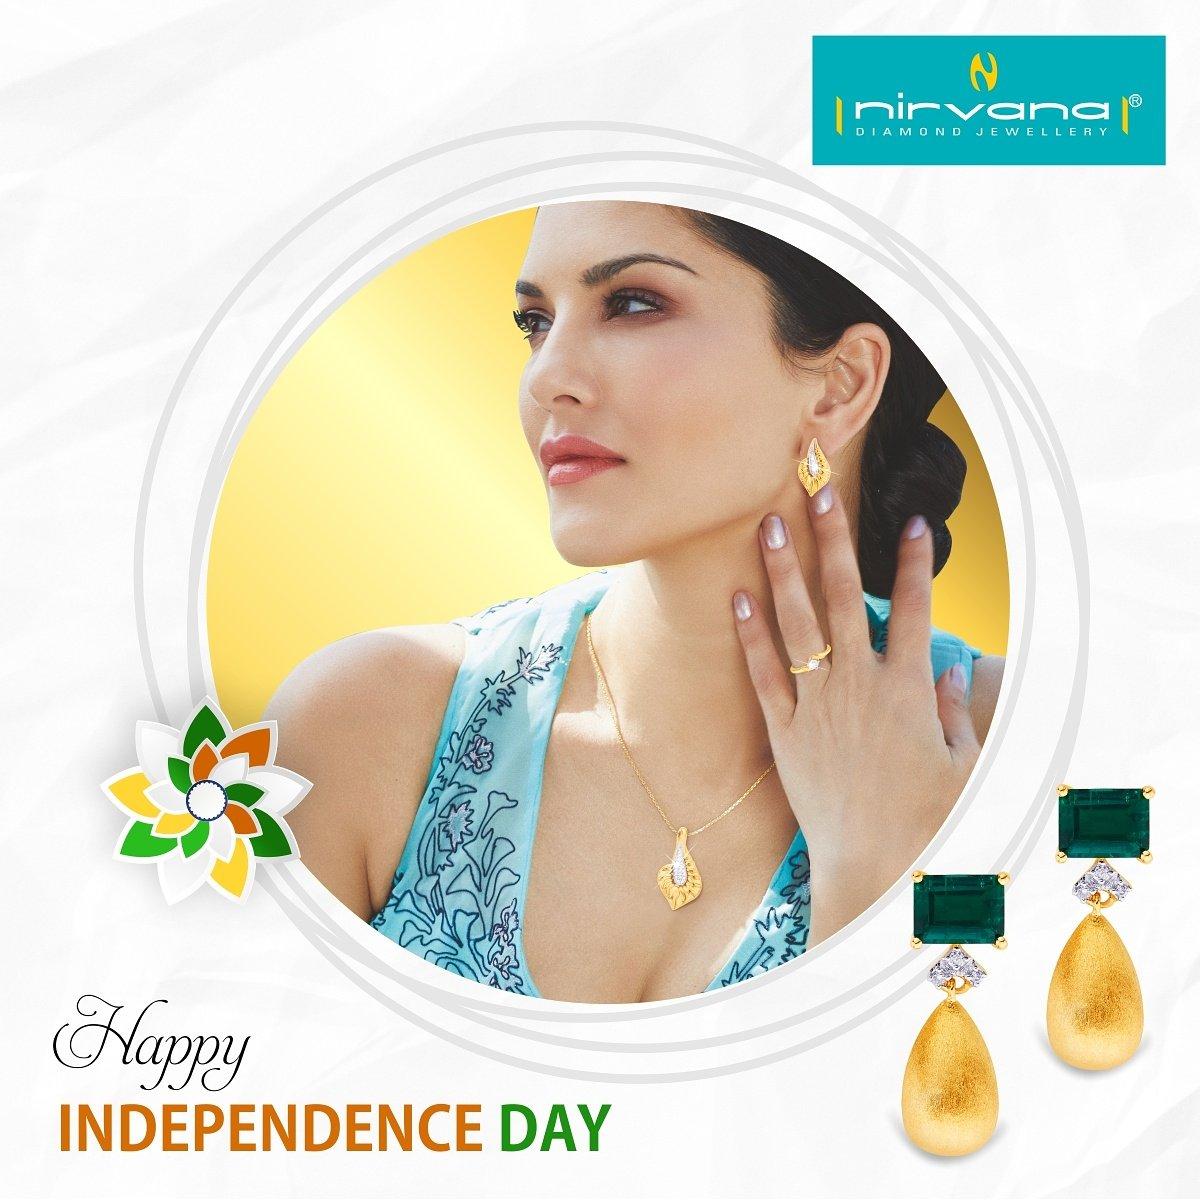 Celebrate #IndependenceDay with  Buy 1 #diamondjewellery and get 1 FREE at